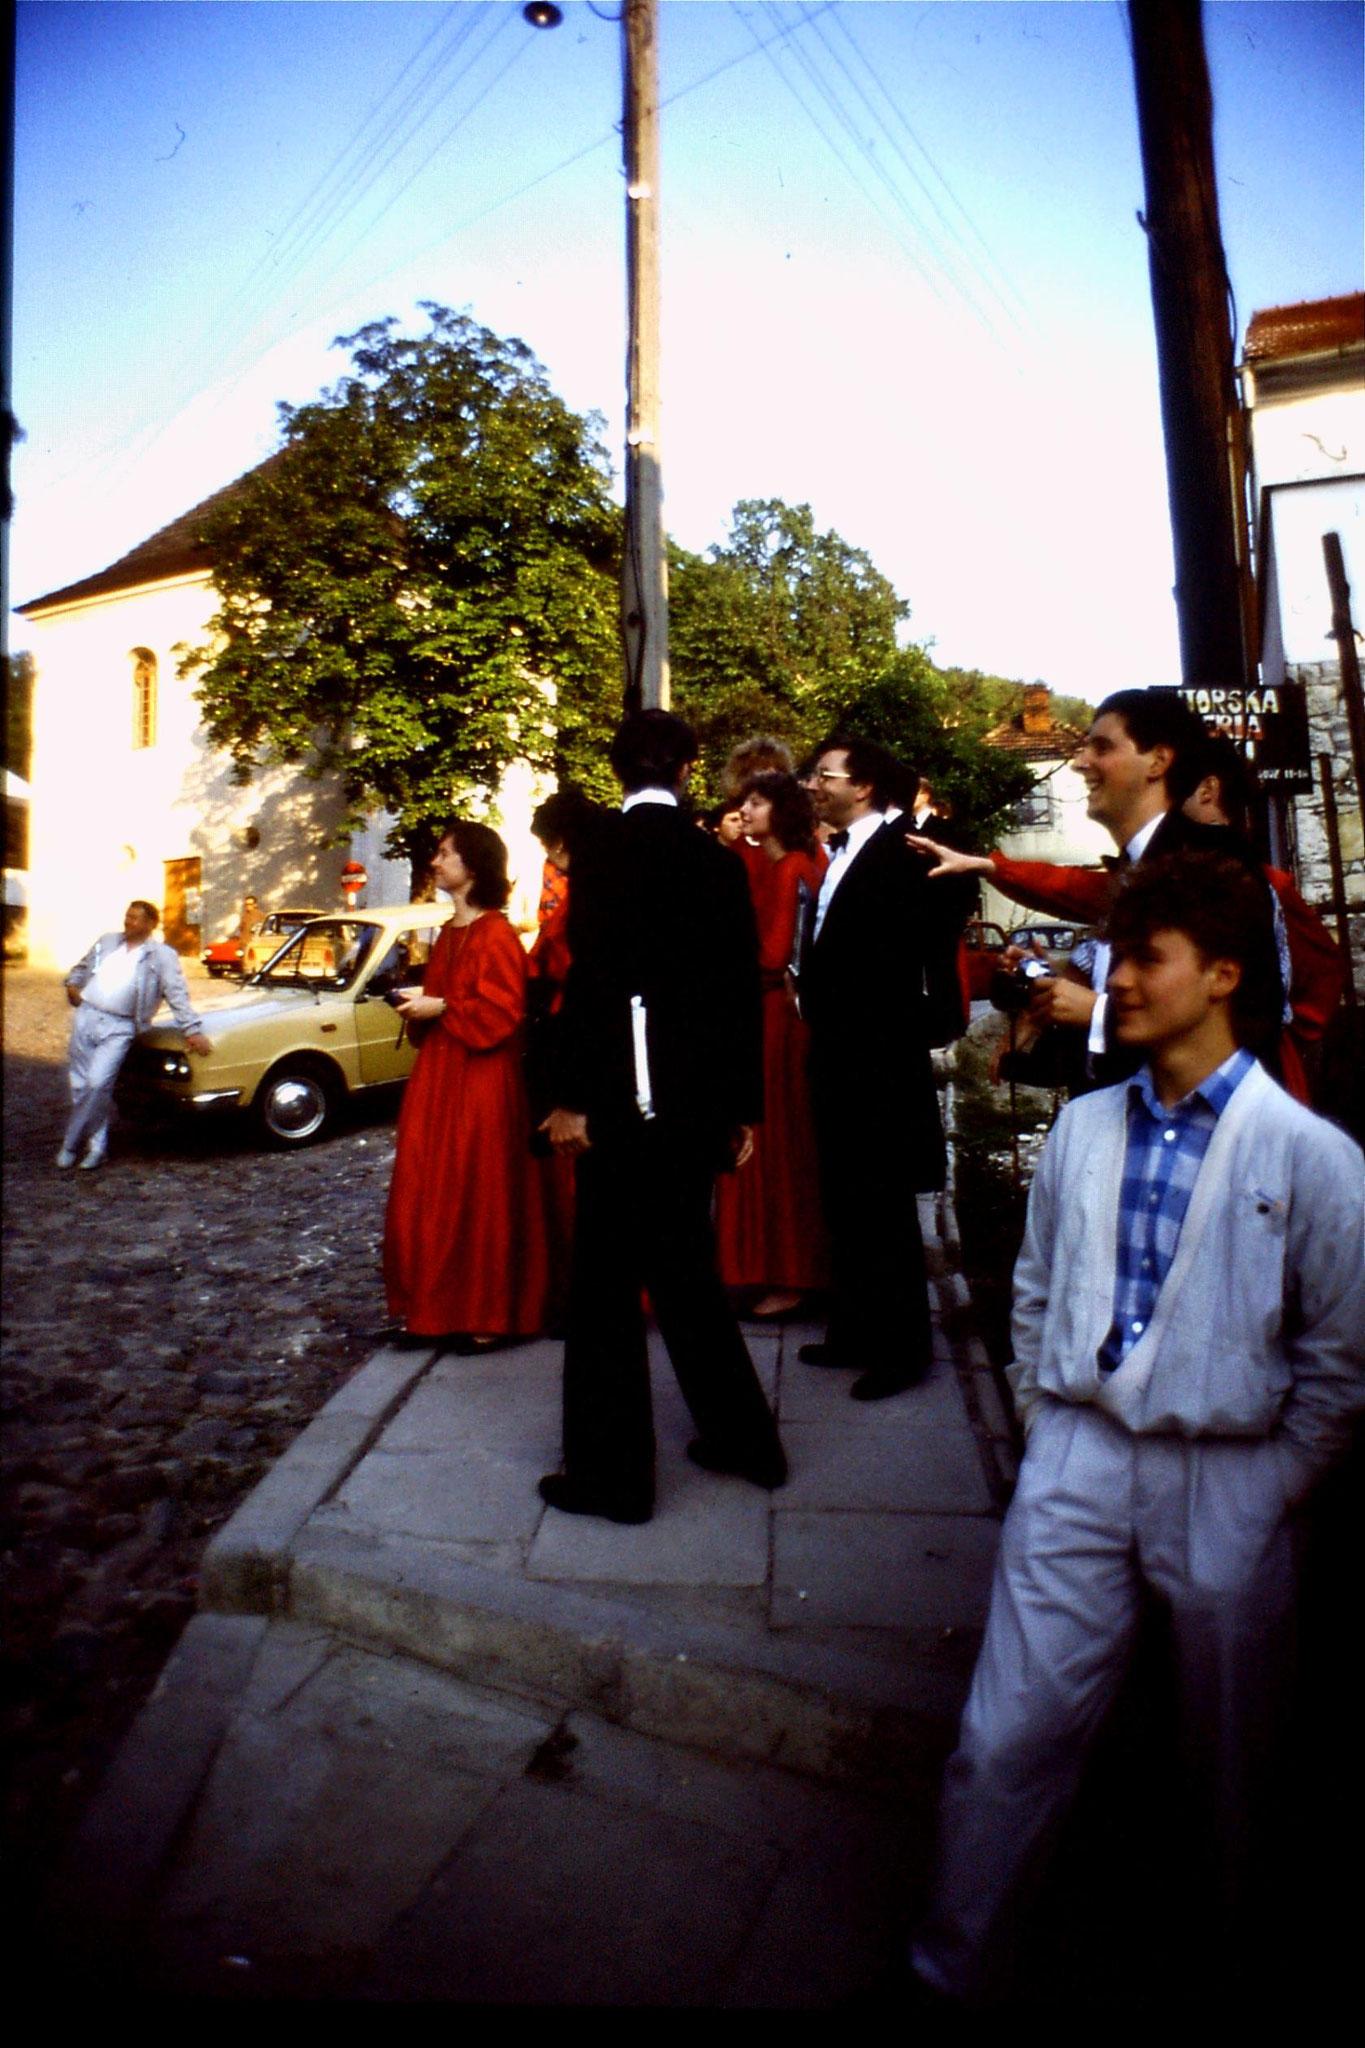 27/8/1988: 9: London Chorale at Kazimierz Dolny